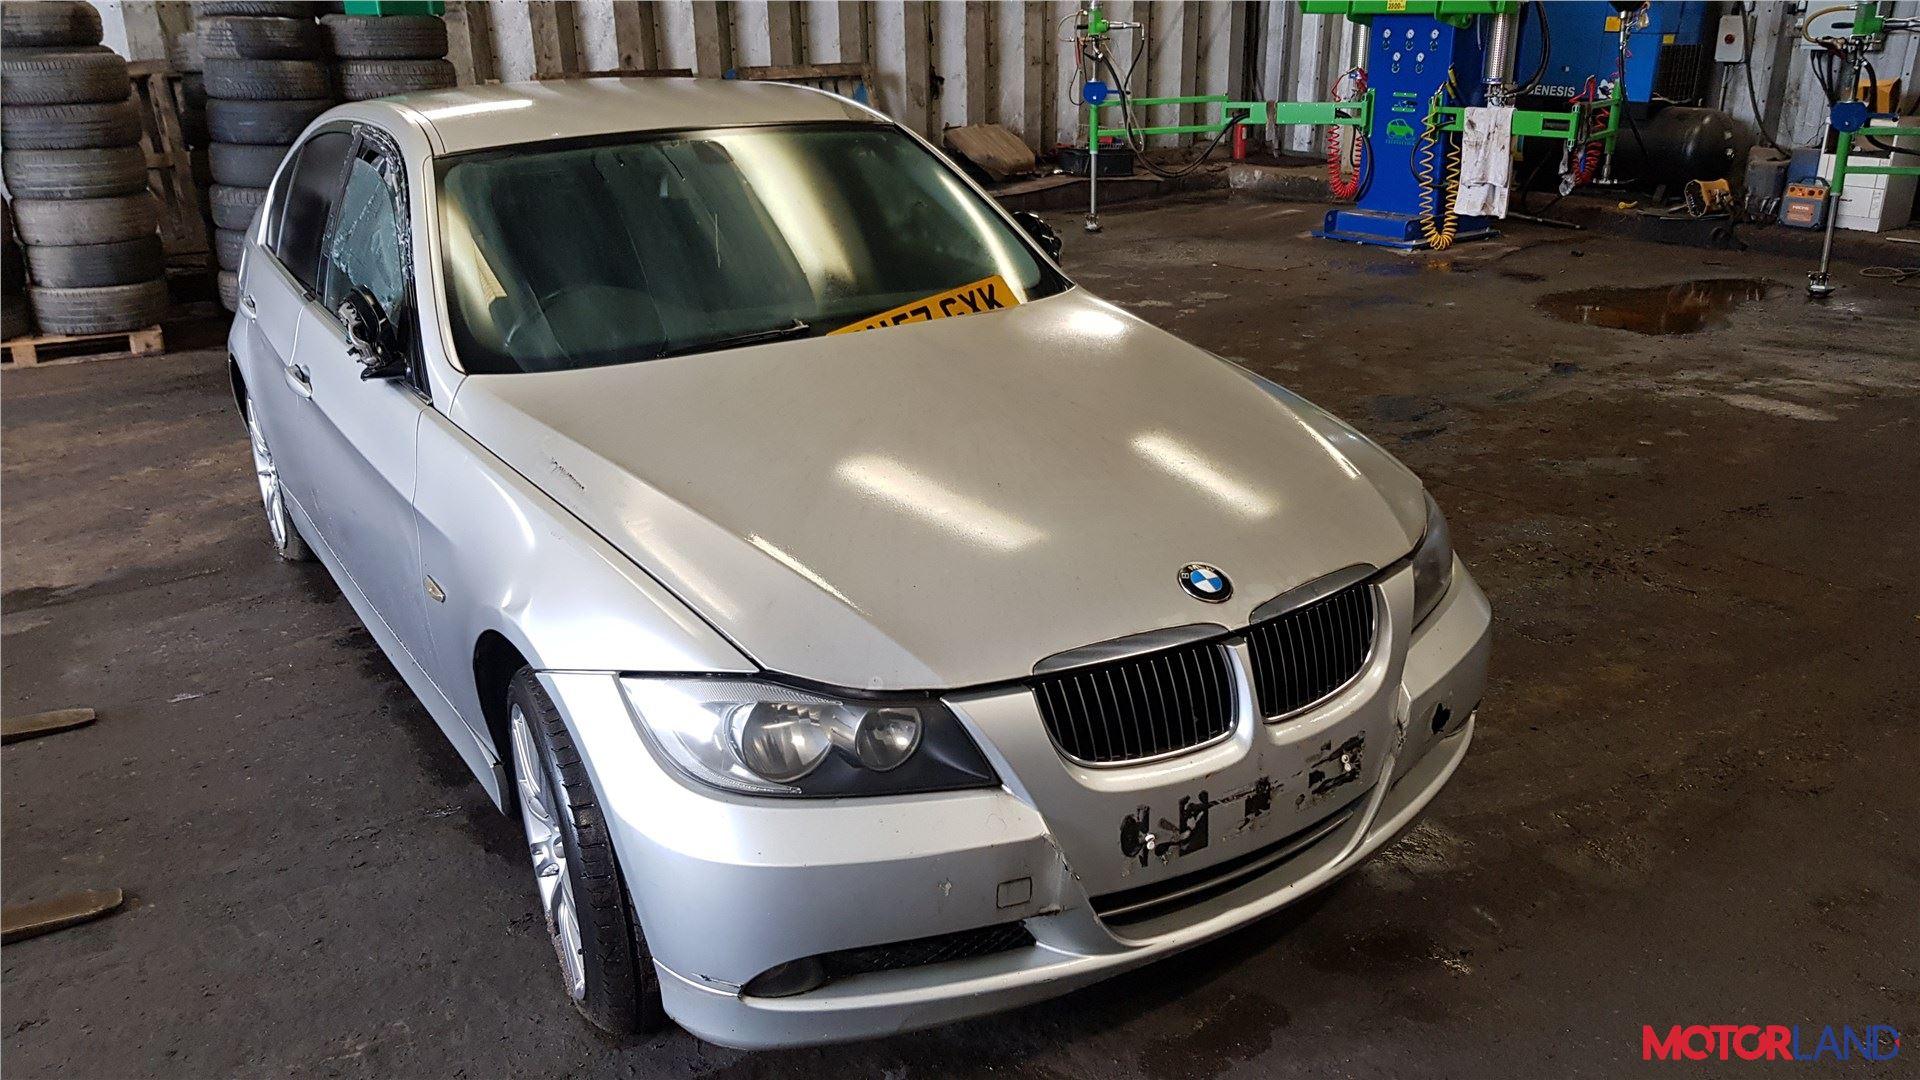 BMW 3 E90 2005-2012, разборочный номер T13072 #1